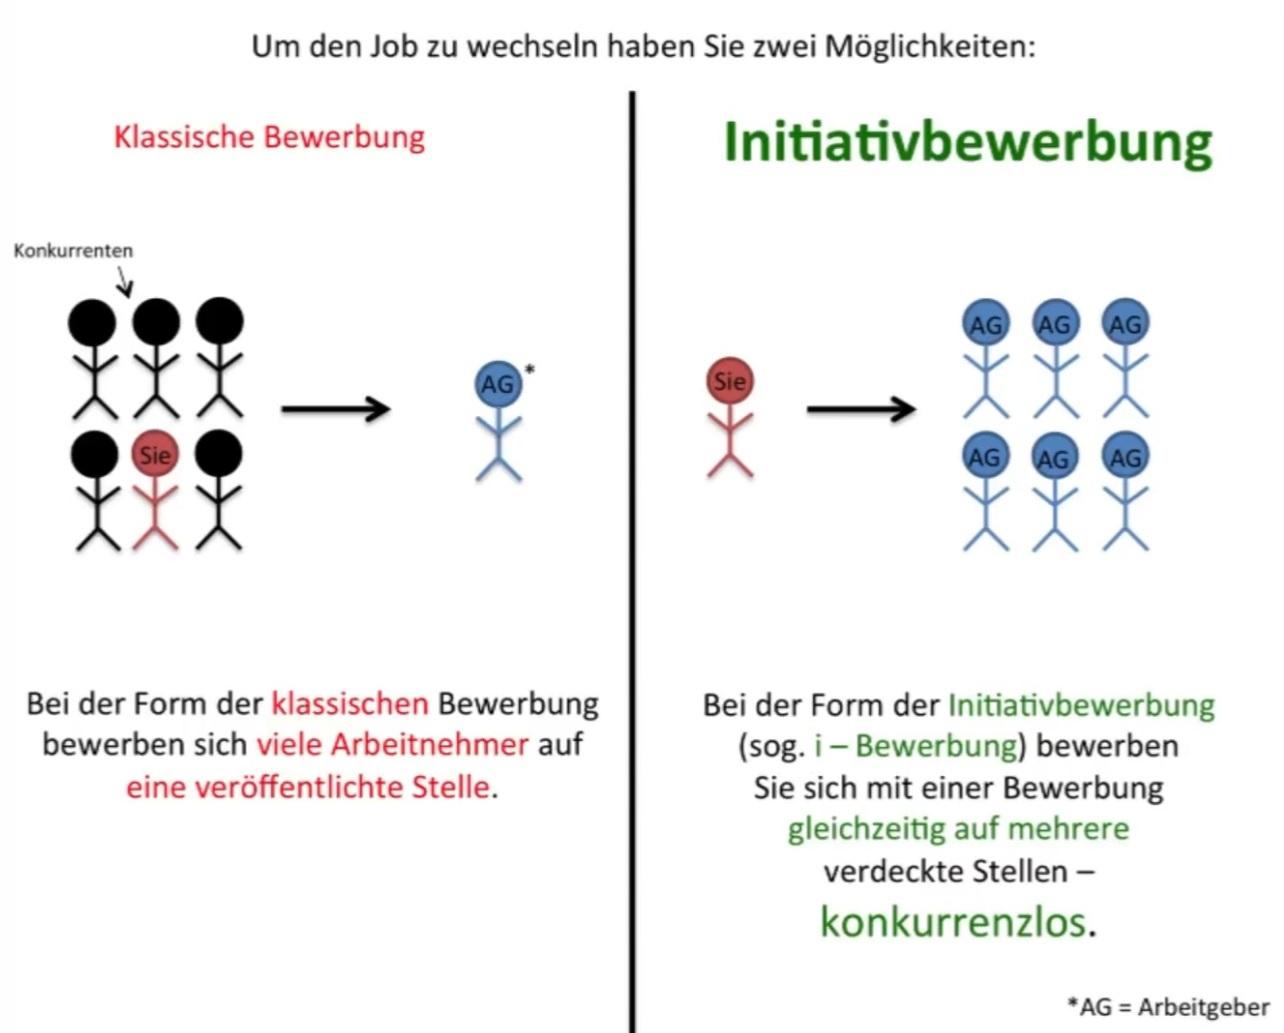 klassische vs. Initiativbewerbung, Quelle: I P S E R, Inter PERSONAL Service